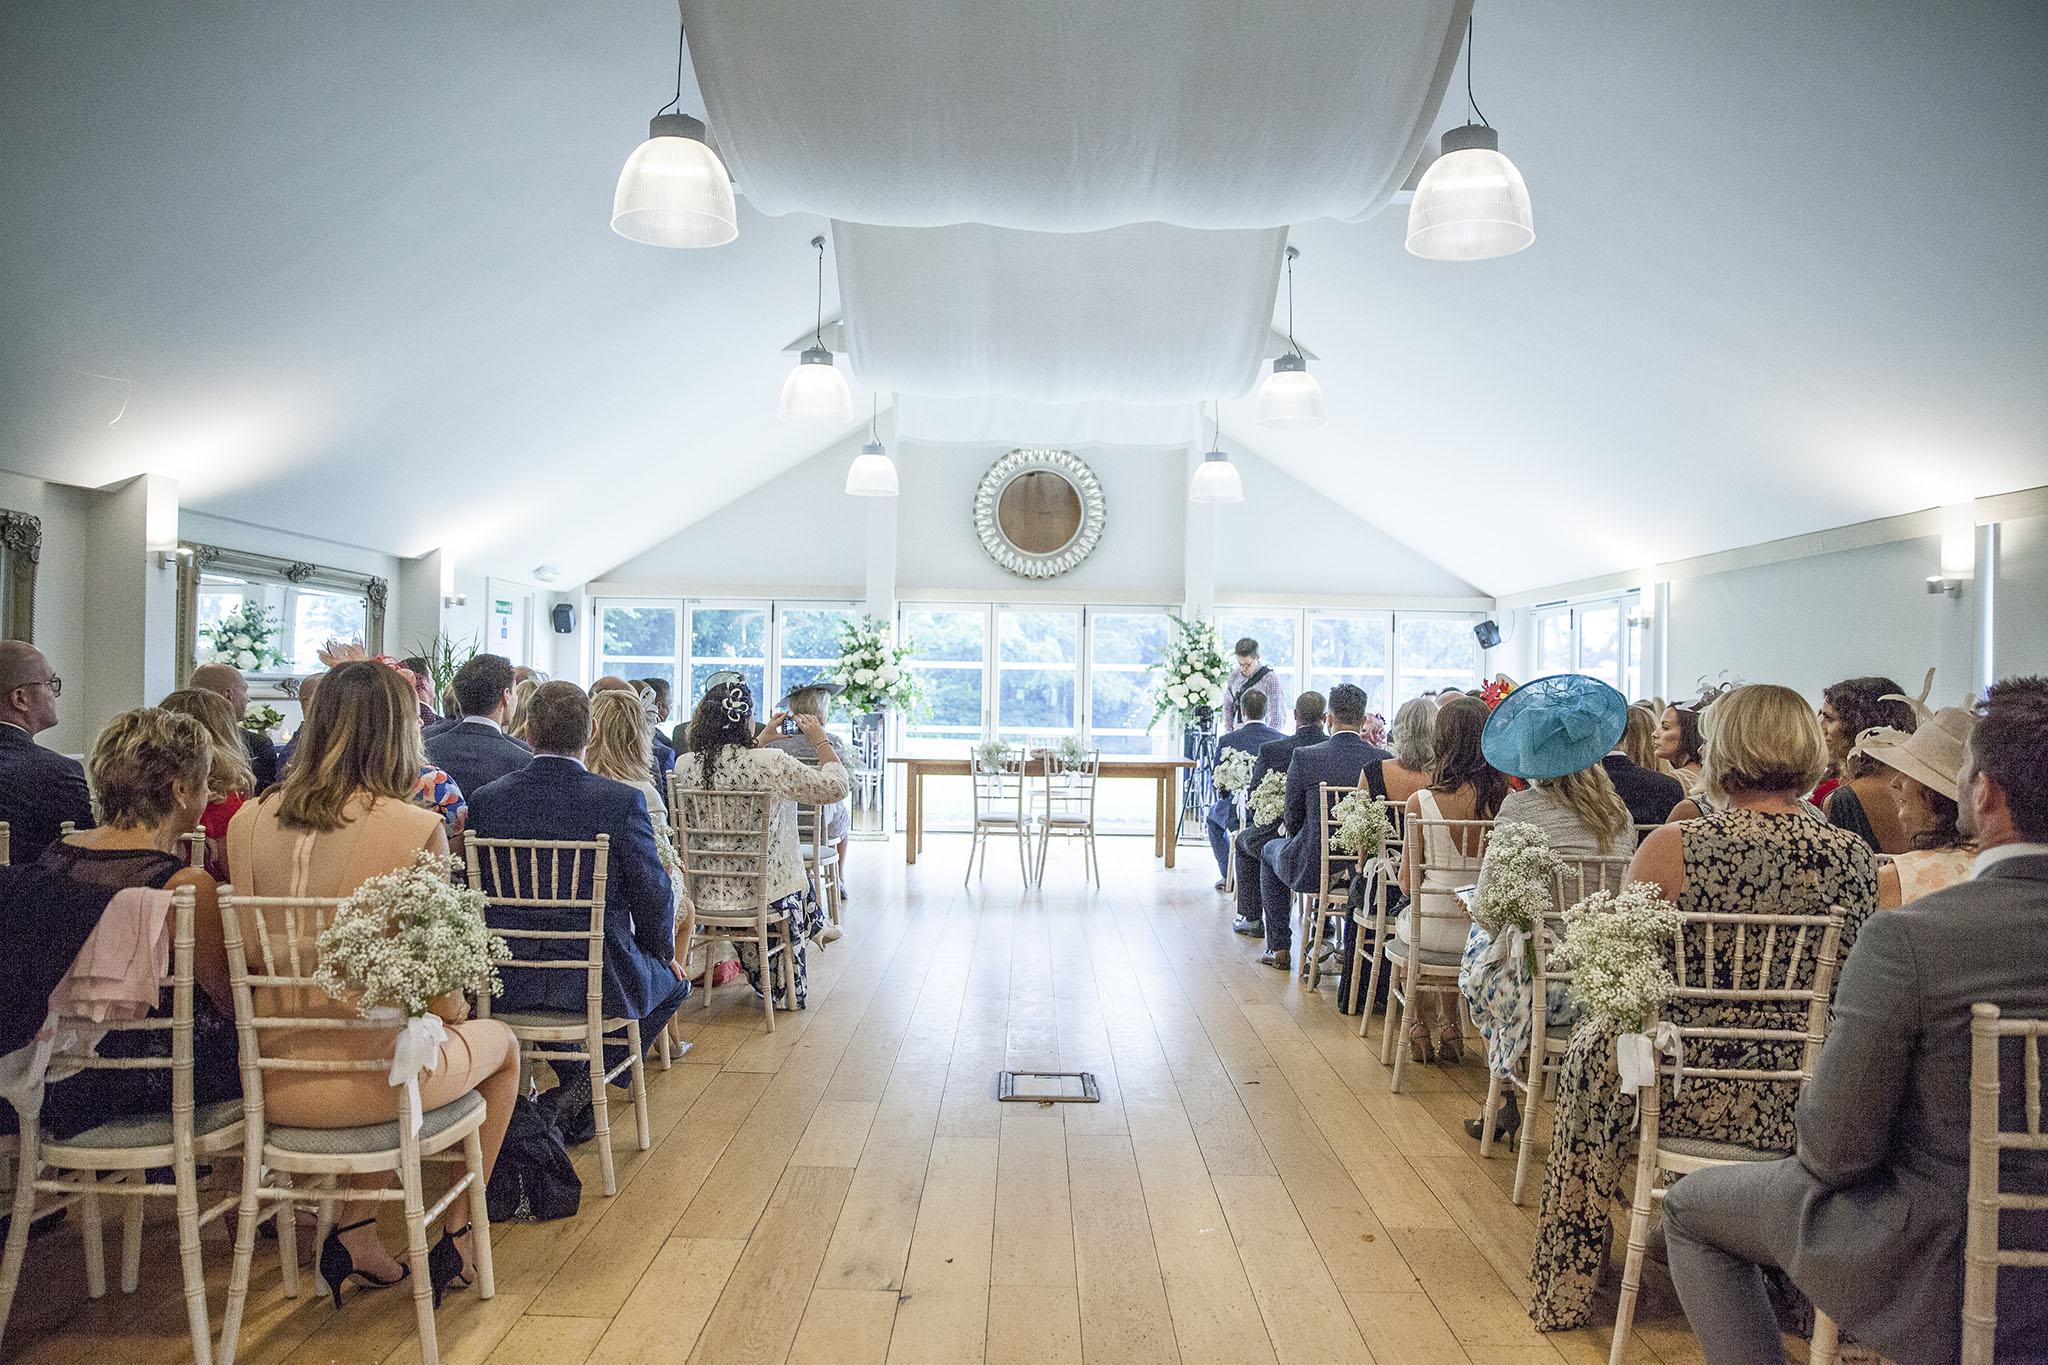 elizabethg_photography_hertfordshire_fineart_photographer_tonycharlie_wedding_photography_aldermaston_wasing_park_reading_22.jpg